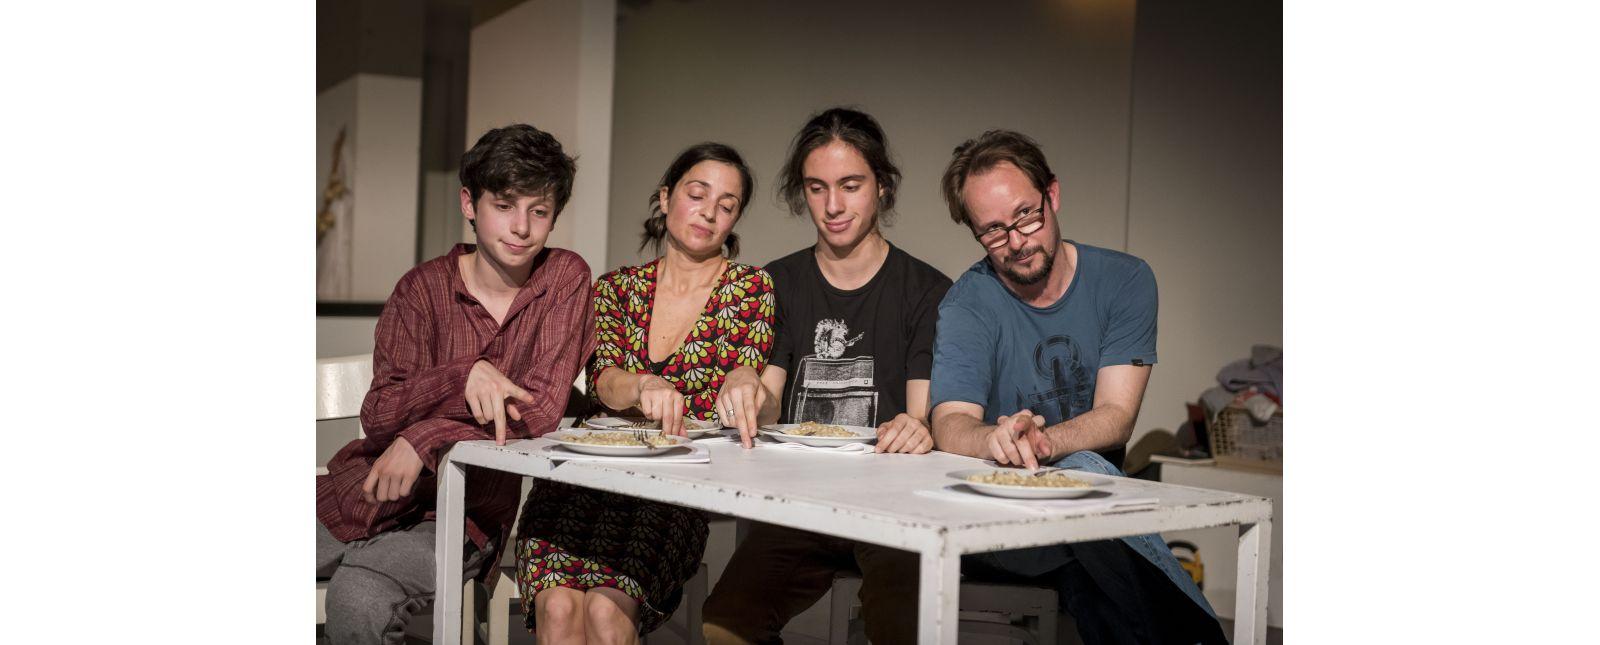 Family Affairs // Simão Pires-Smith, Maria Pires, Vasco Pires-Smith & Graham Smith // Marc Doradzillo // 2018